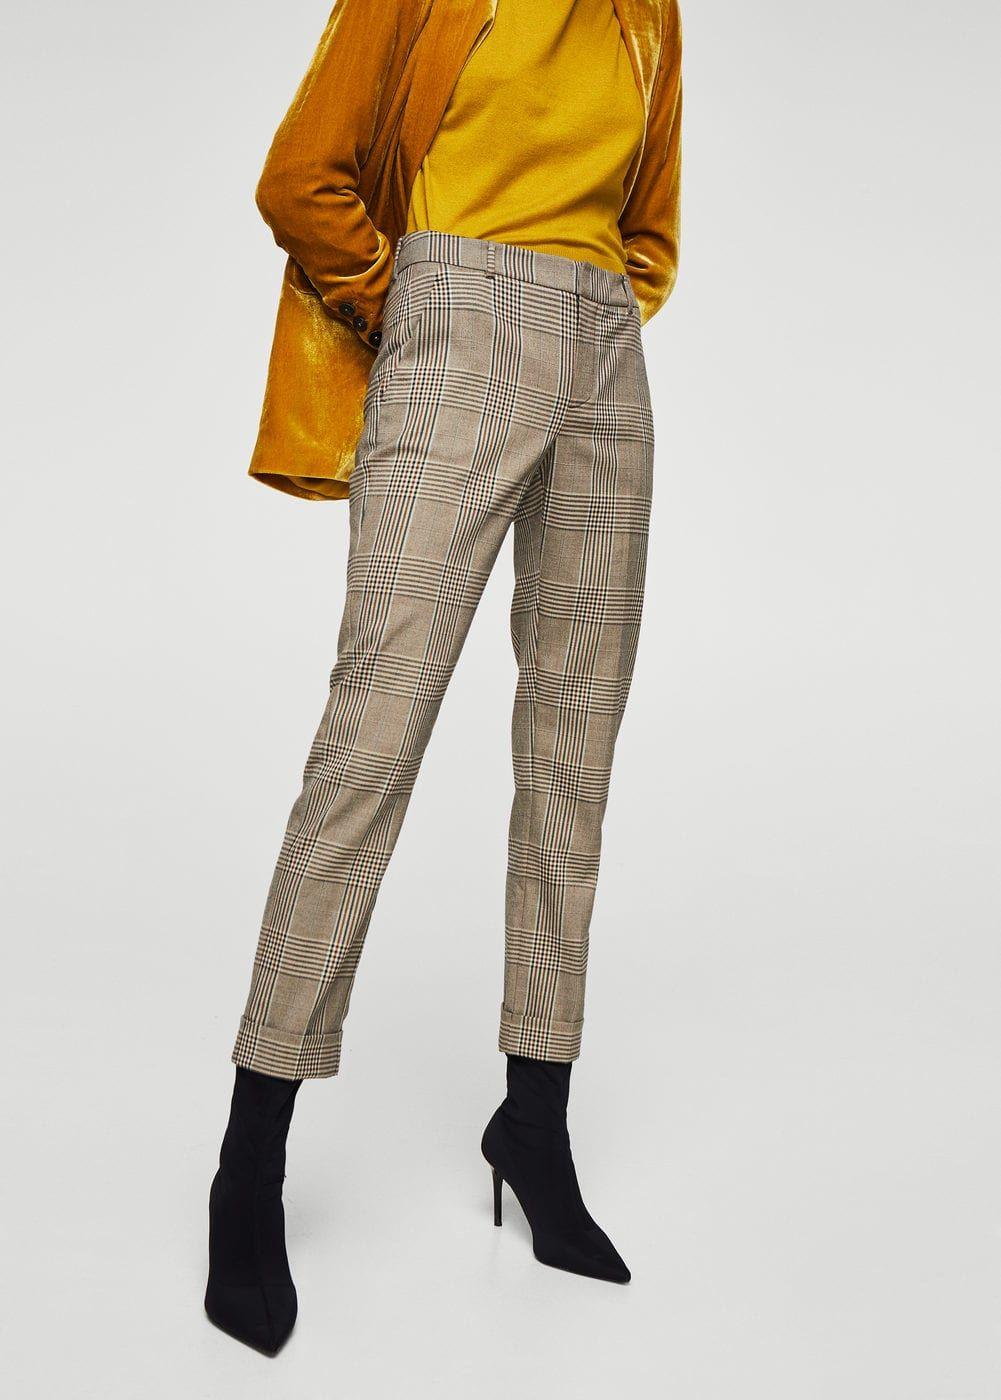 Pantalón algodón cuadros - Mujer en 2019  d3c7783693f9